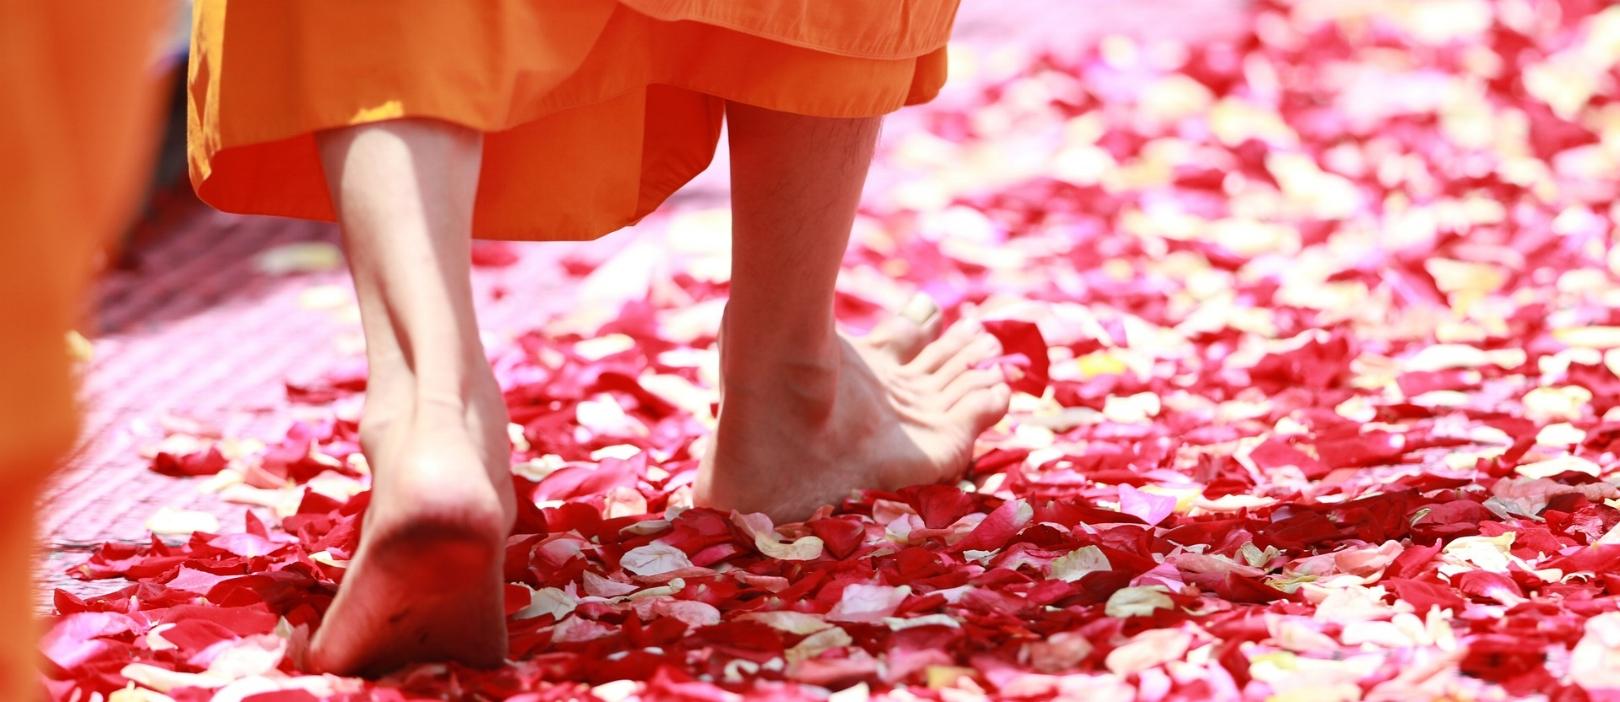 Walking Meditation with Zen Monks - Photo credit: Pixabay